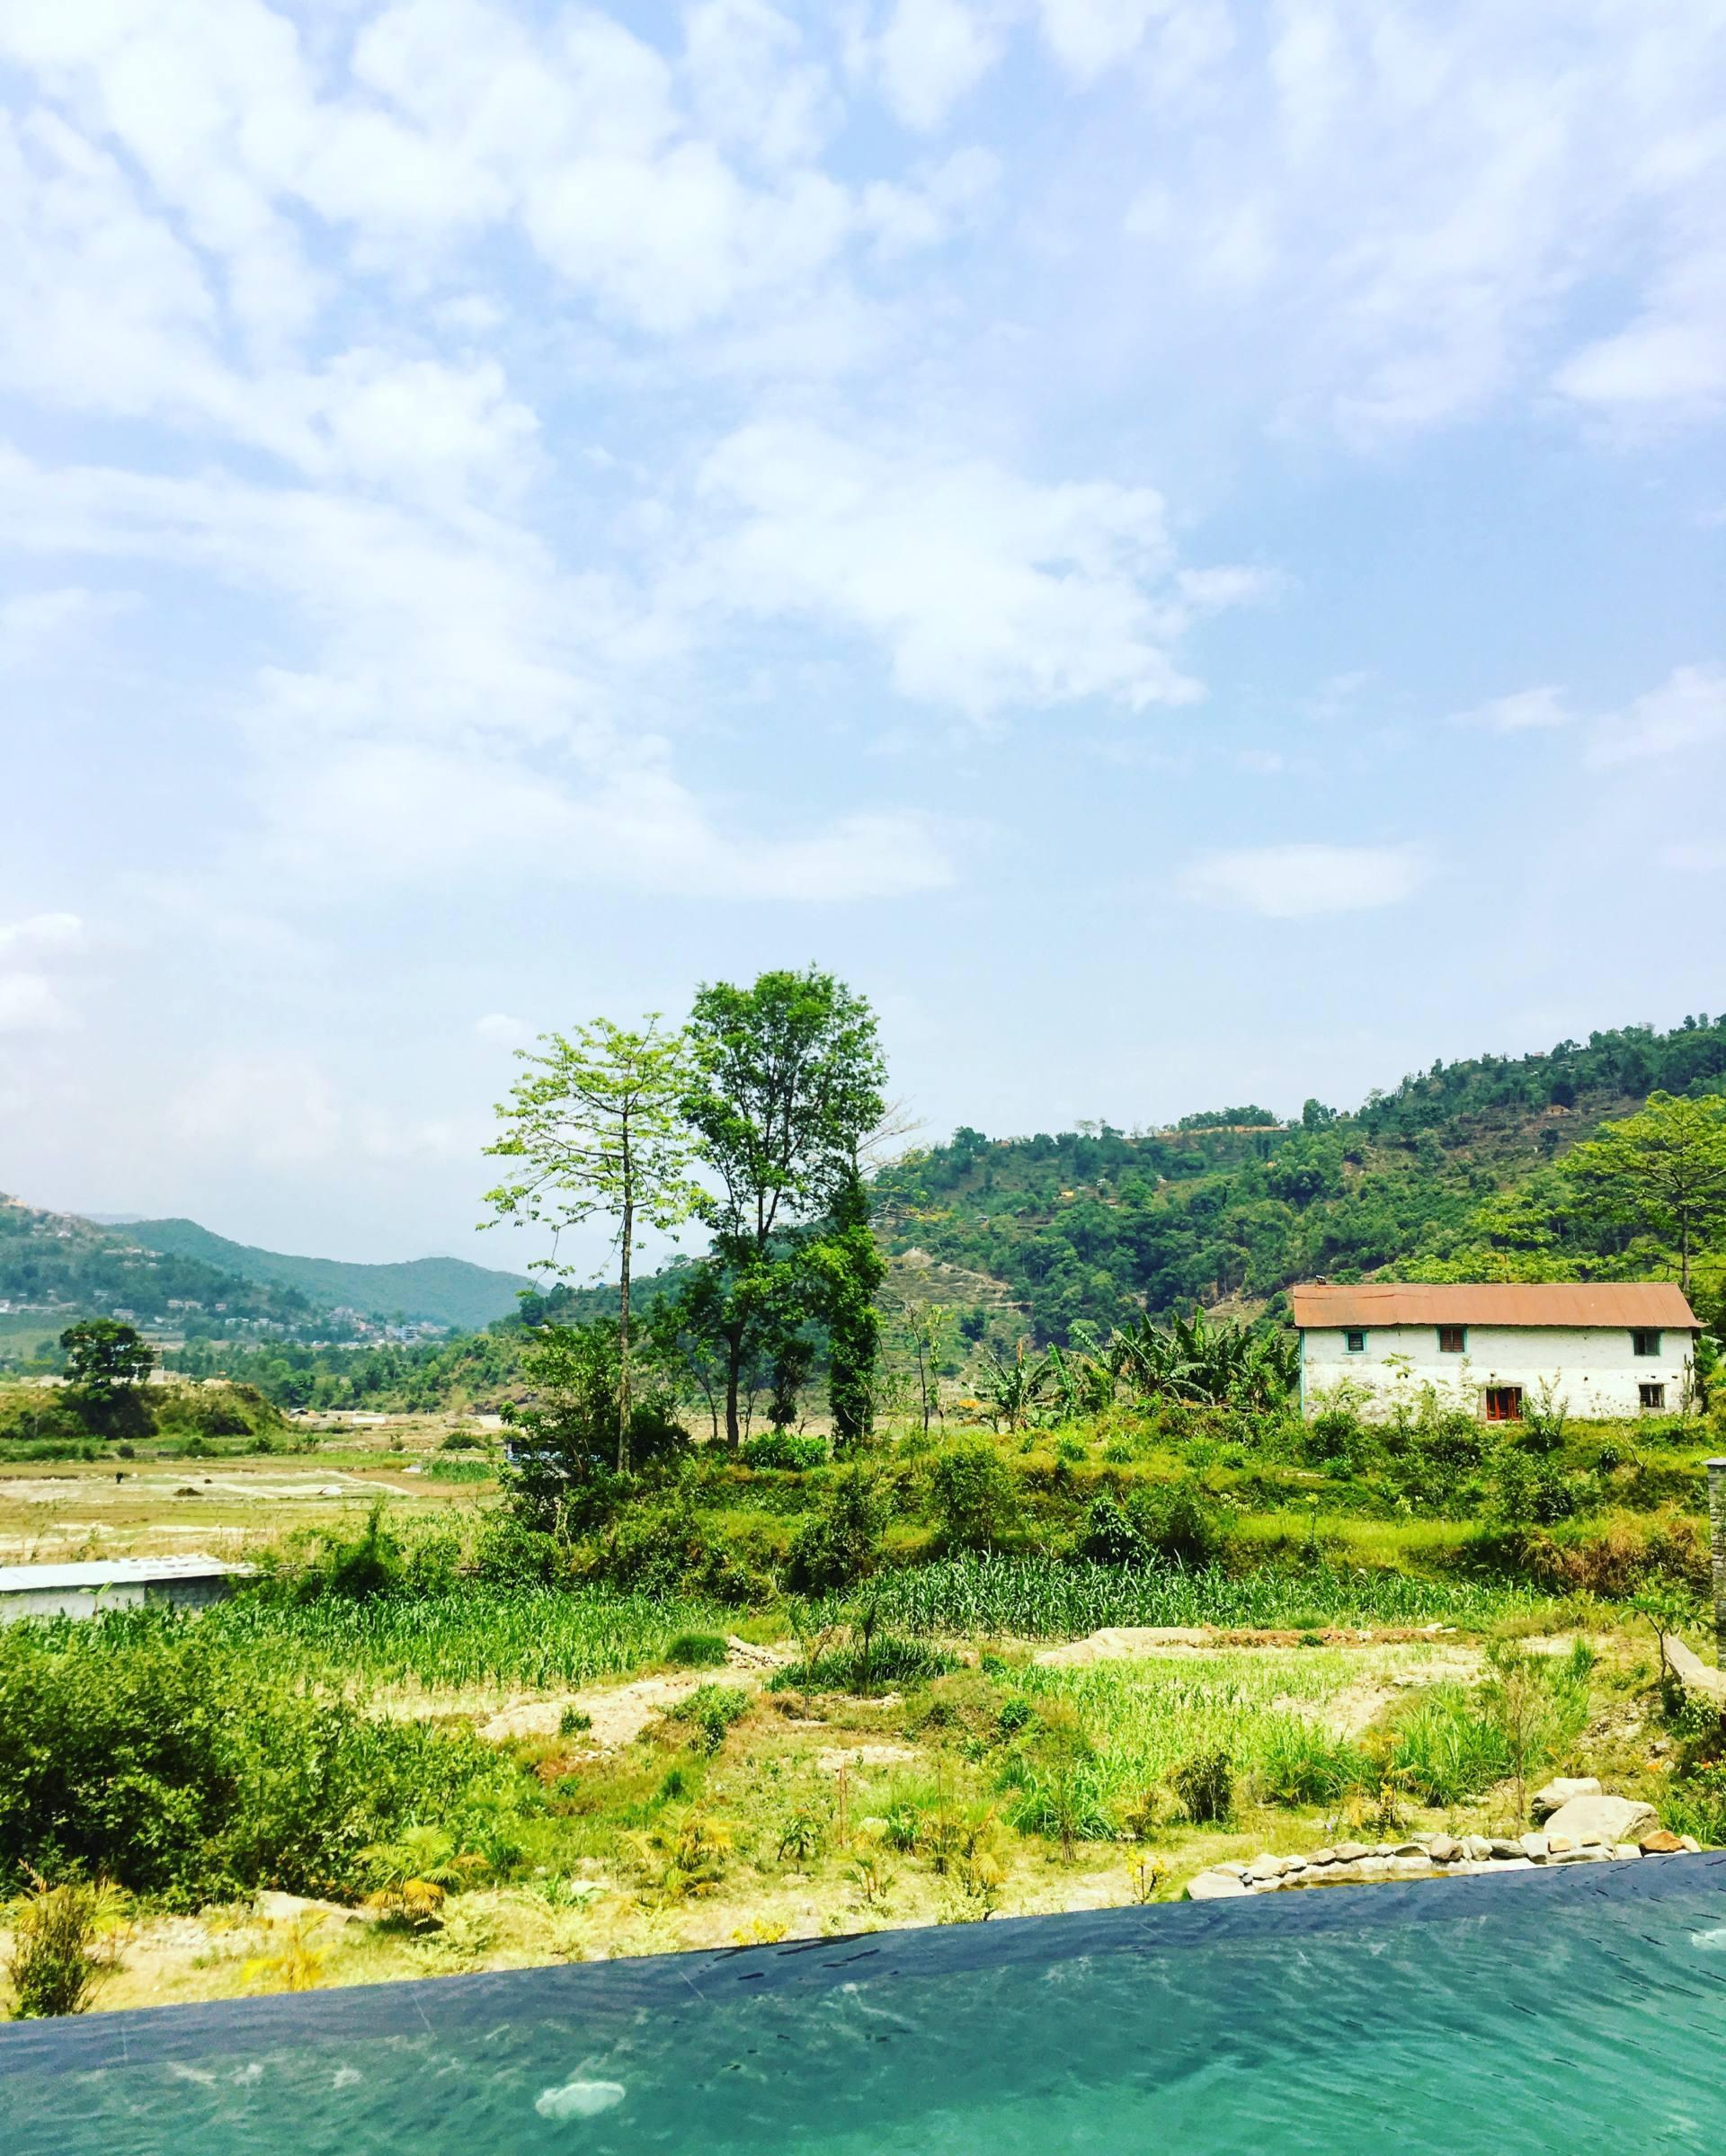 nepal through the lens of instagram